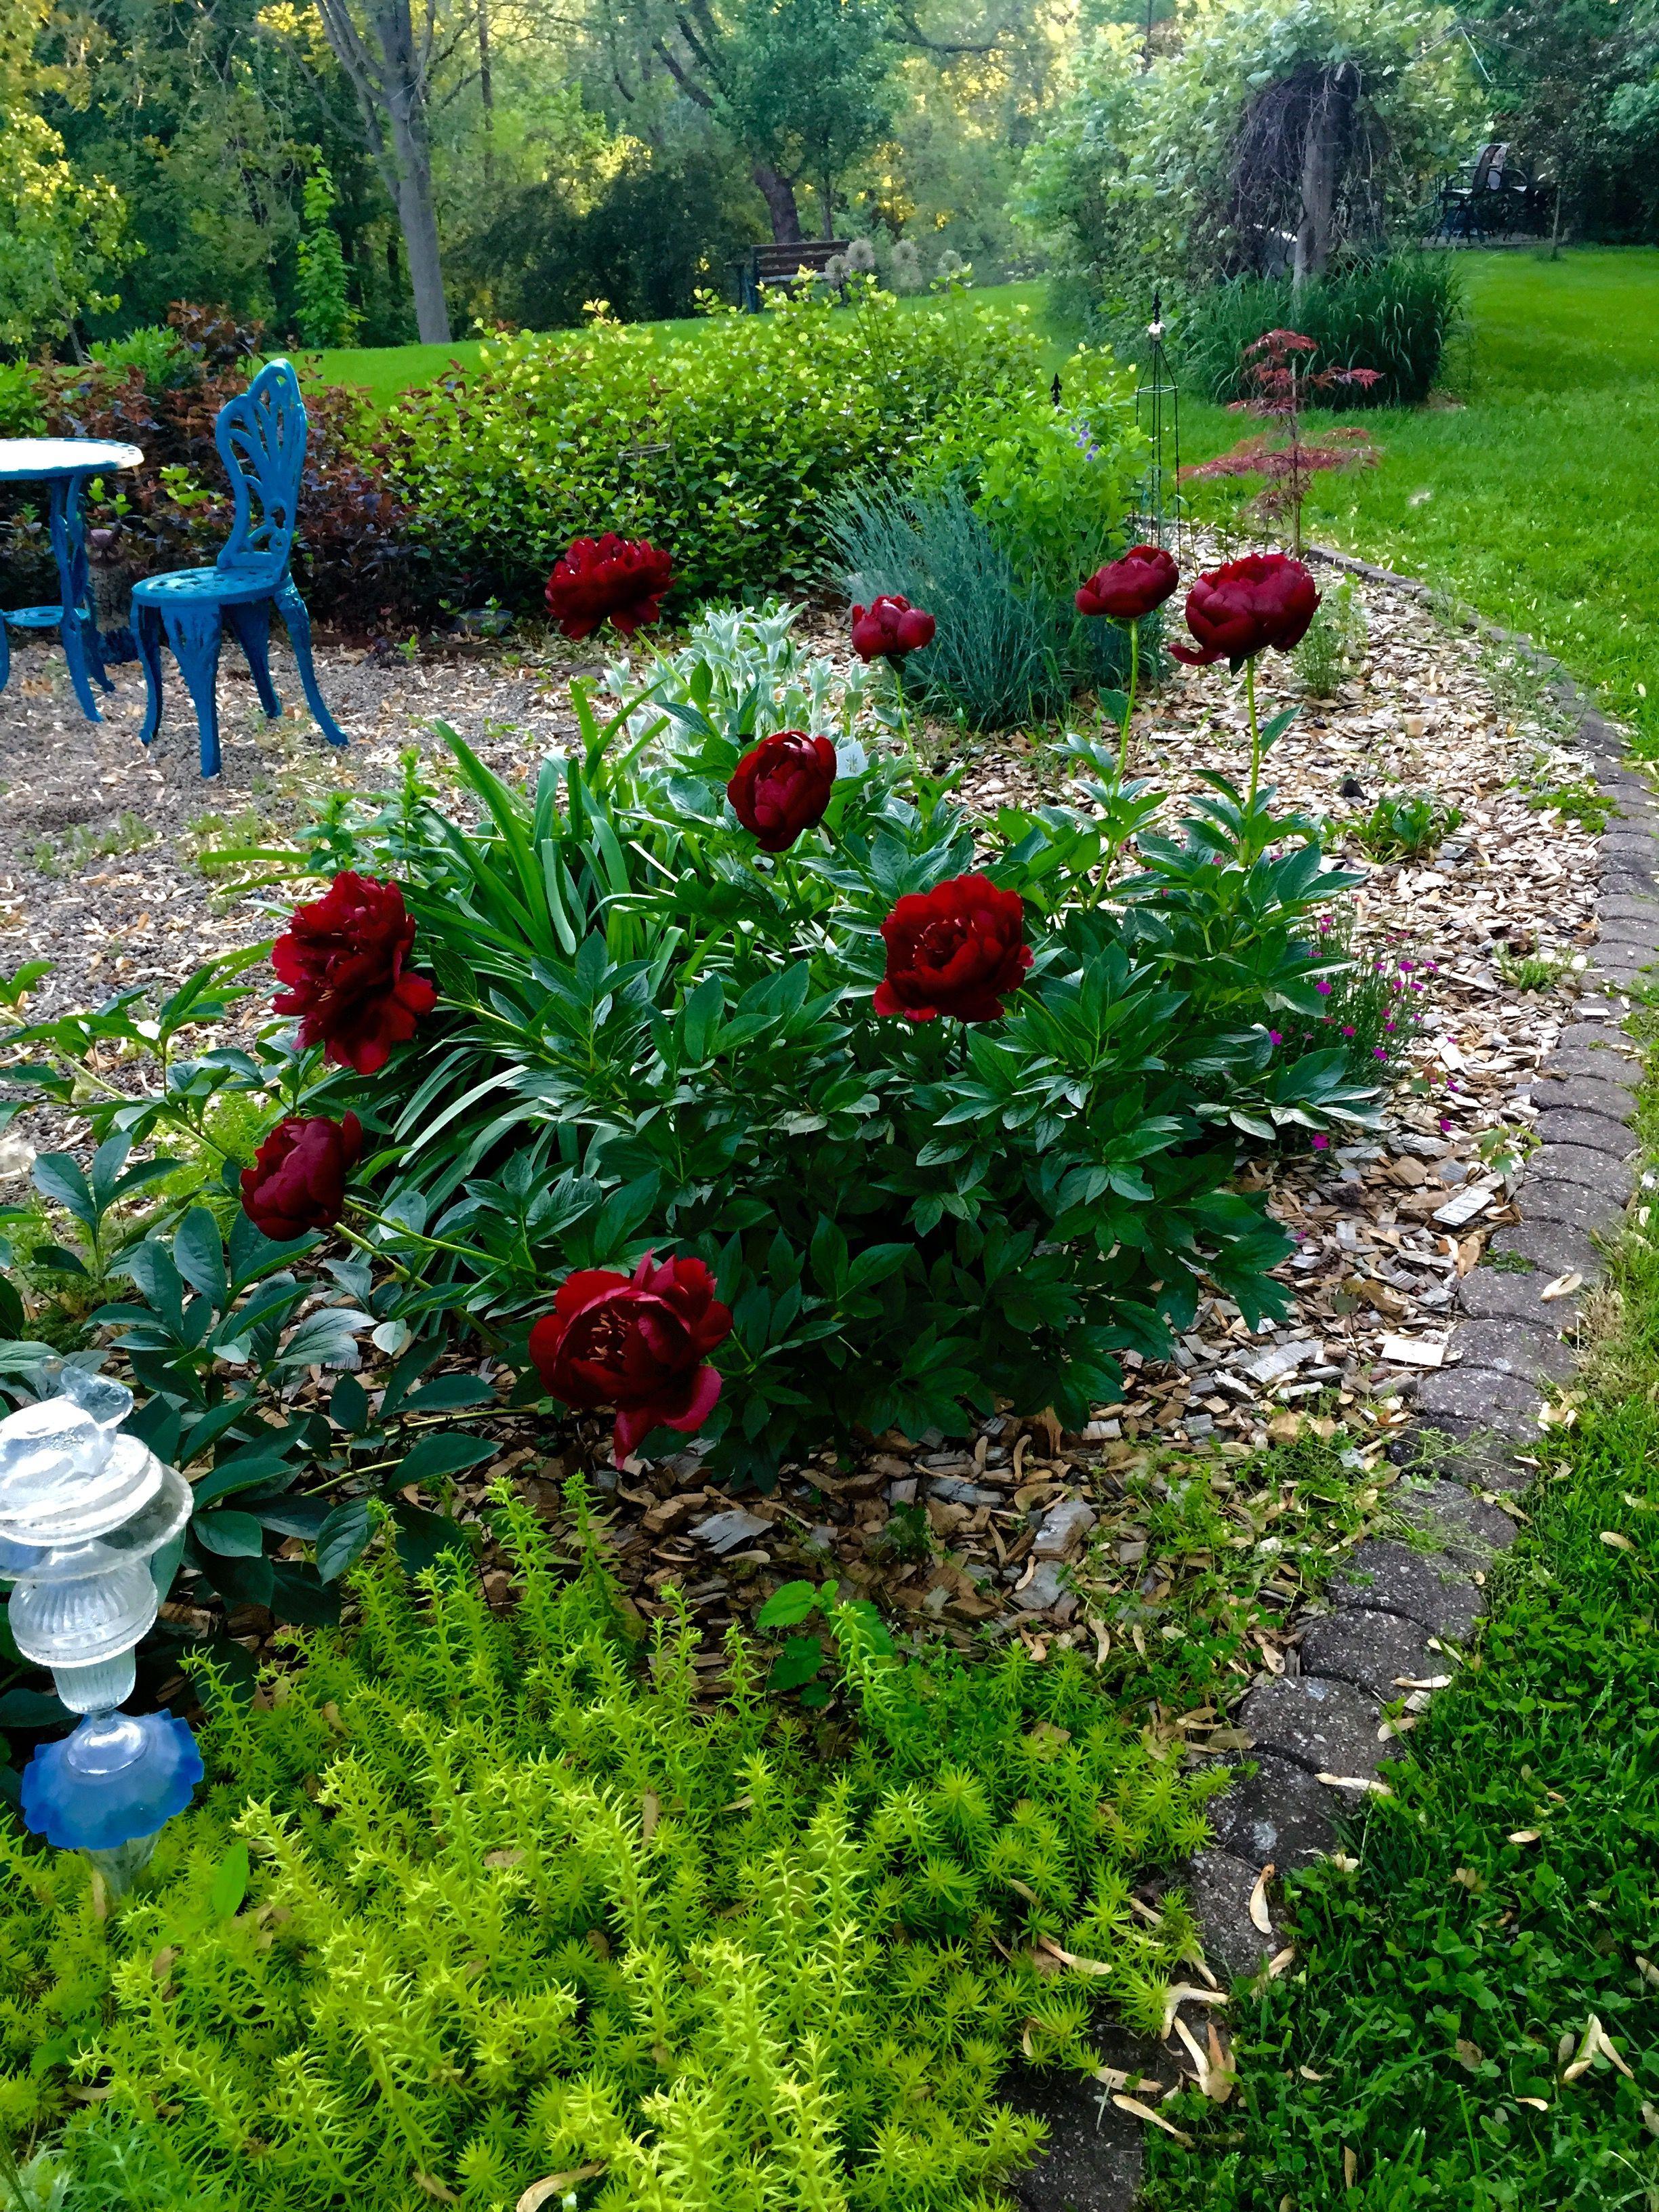 Pin by Regina Walters on garden likes   Outdoor decor ...